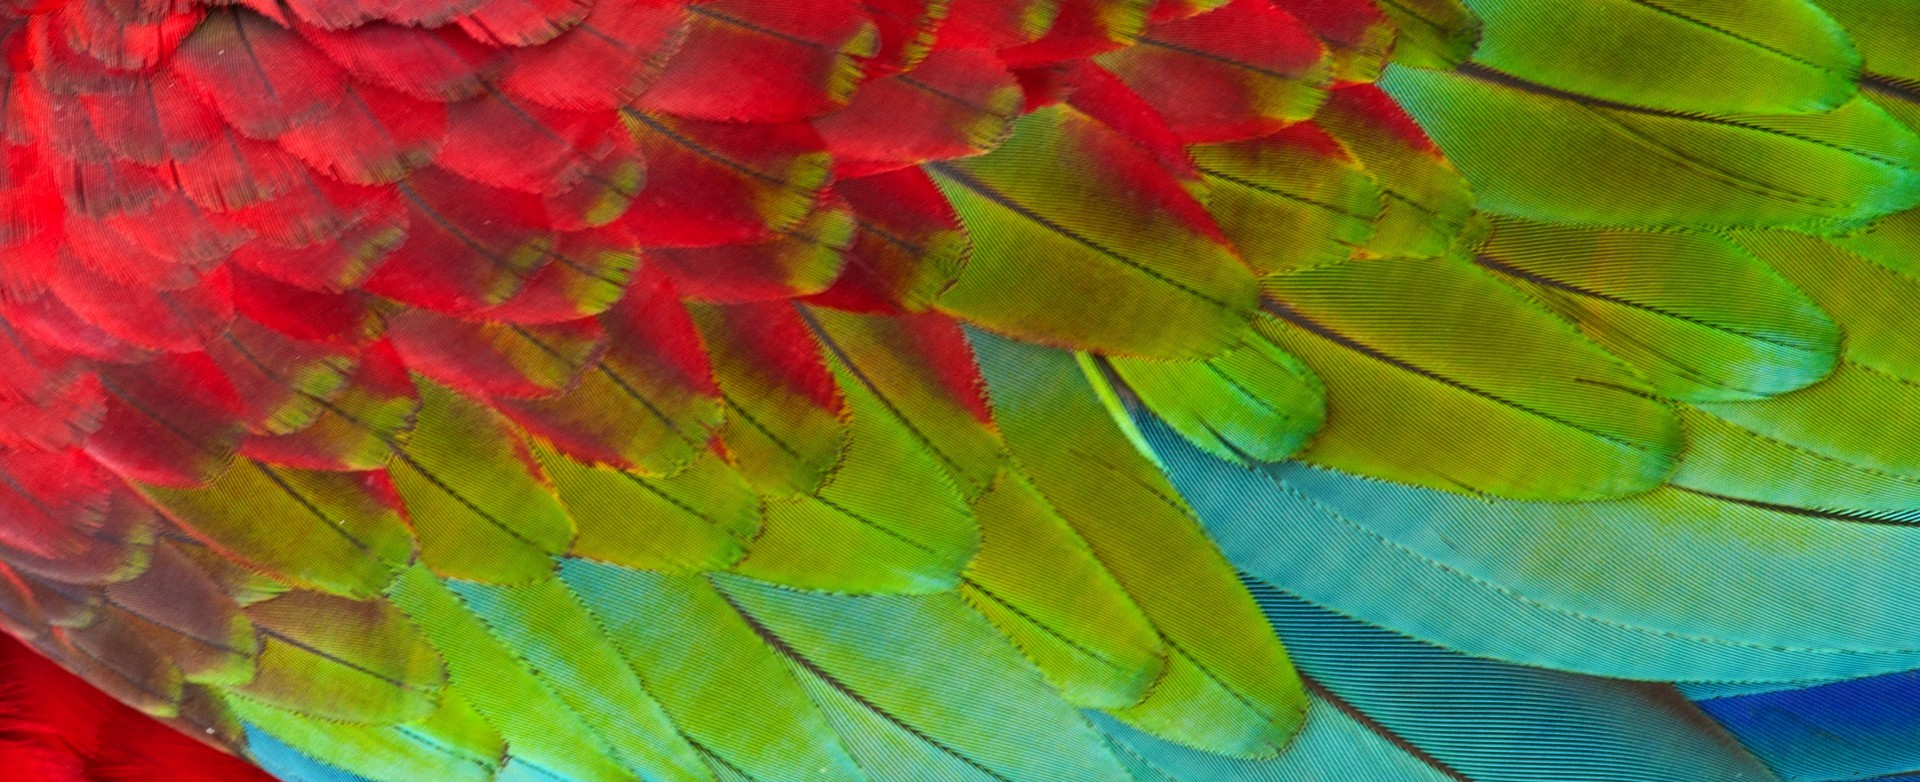 Djikee feathers